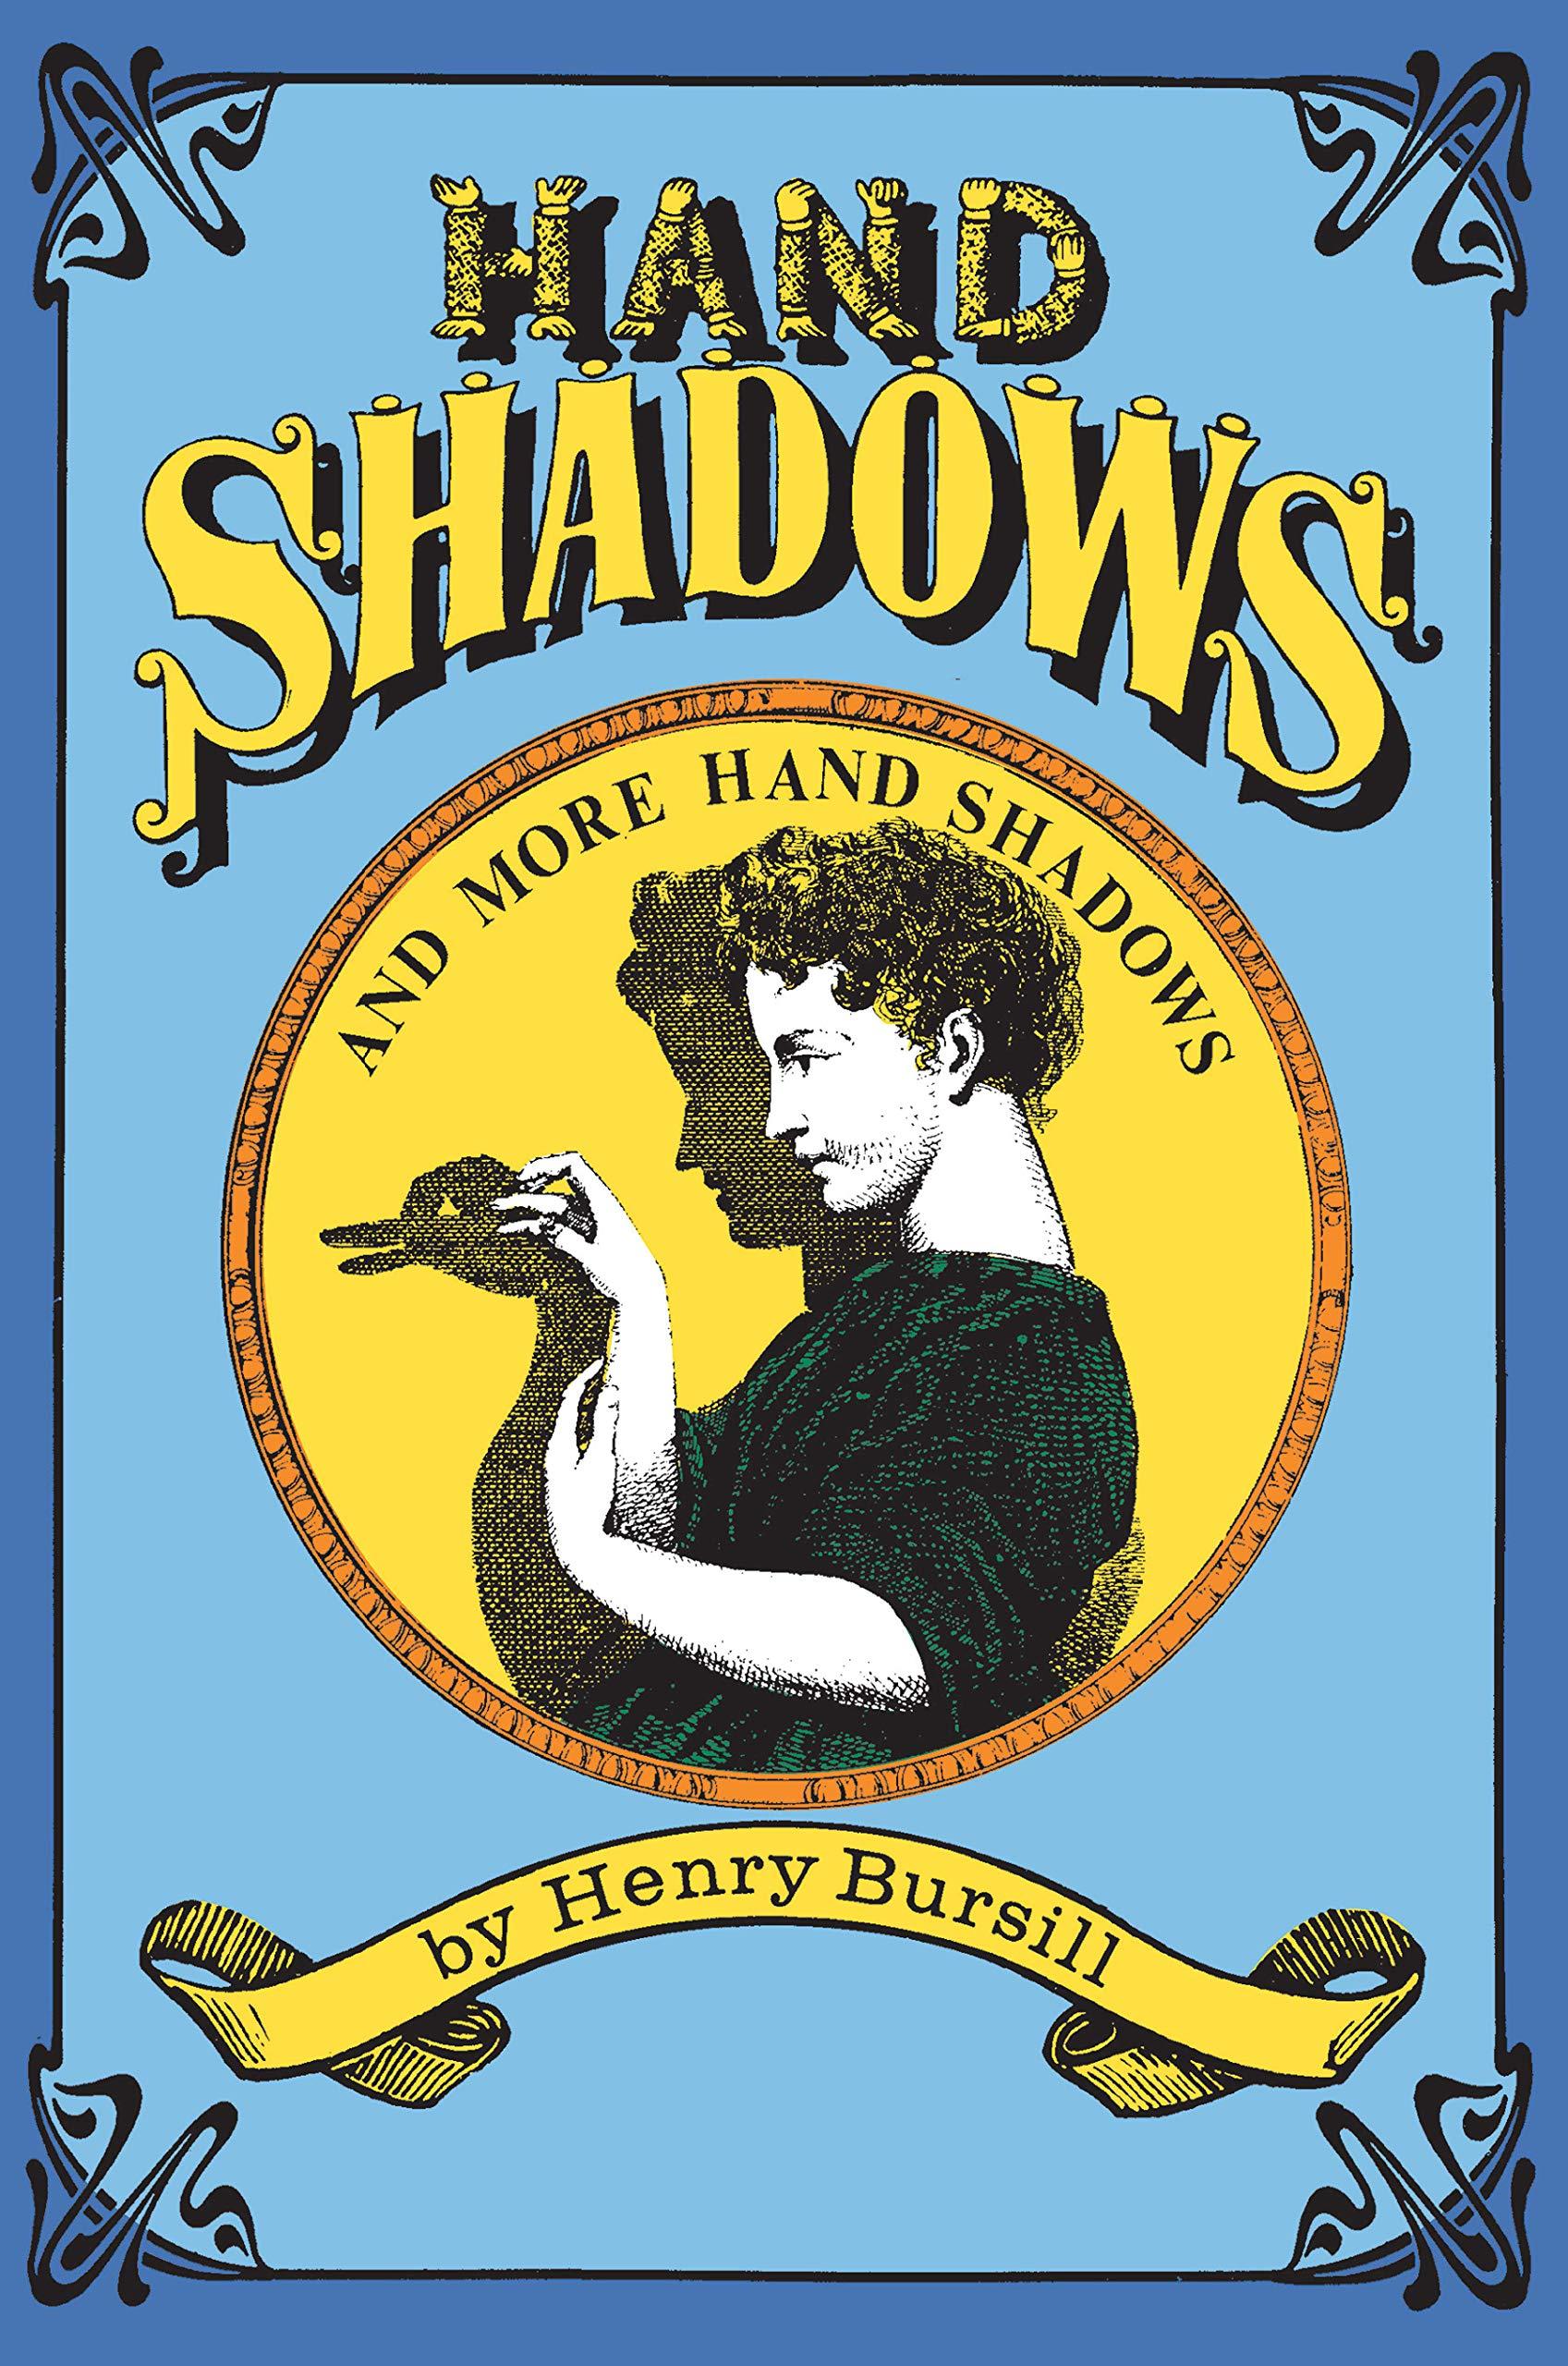 Hand Shadows and More Hand Shadows (Dover Children's Activity Books): Henry  Bursill: 9780486295138: Amazon.com: Books